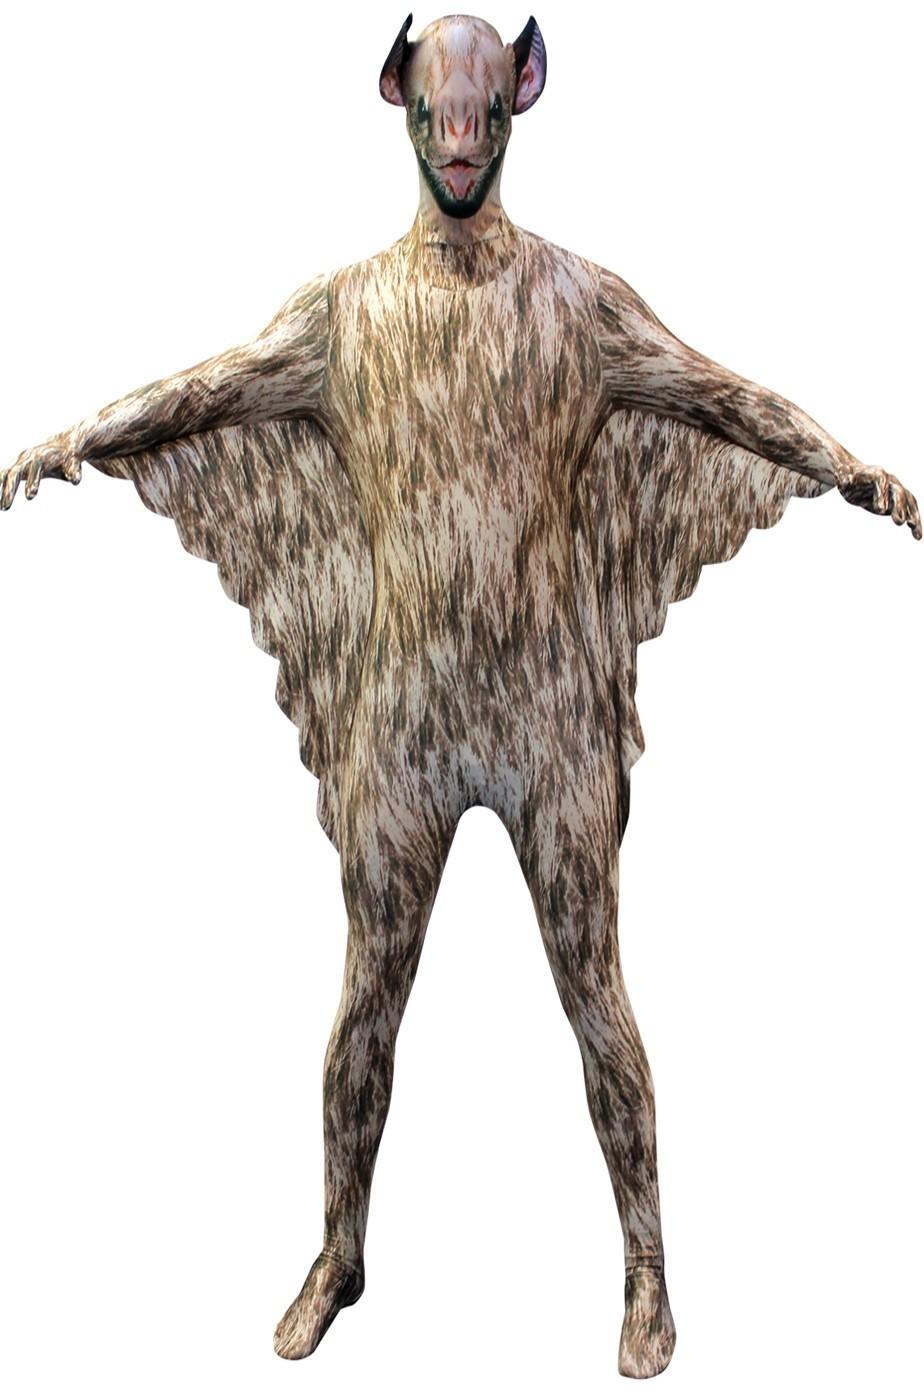 Costume Morphsuit Pipistrello Vampiro 2nd skin seconda pelle M